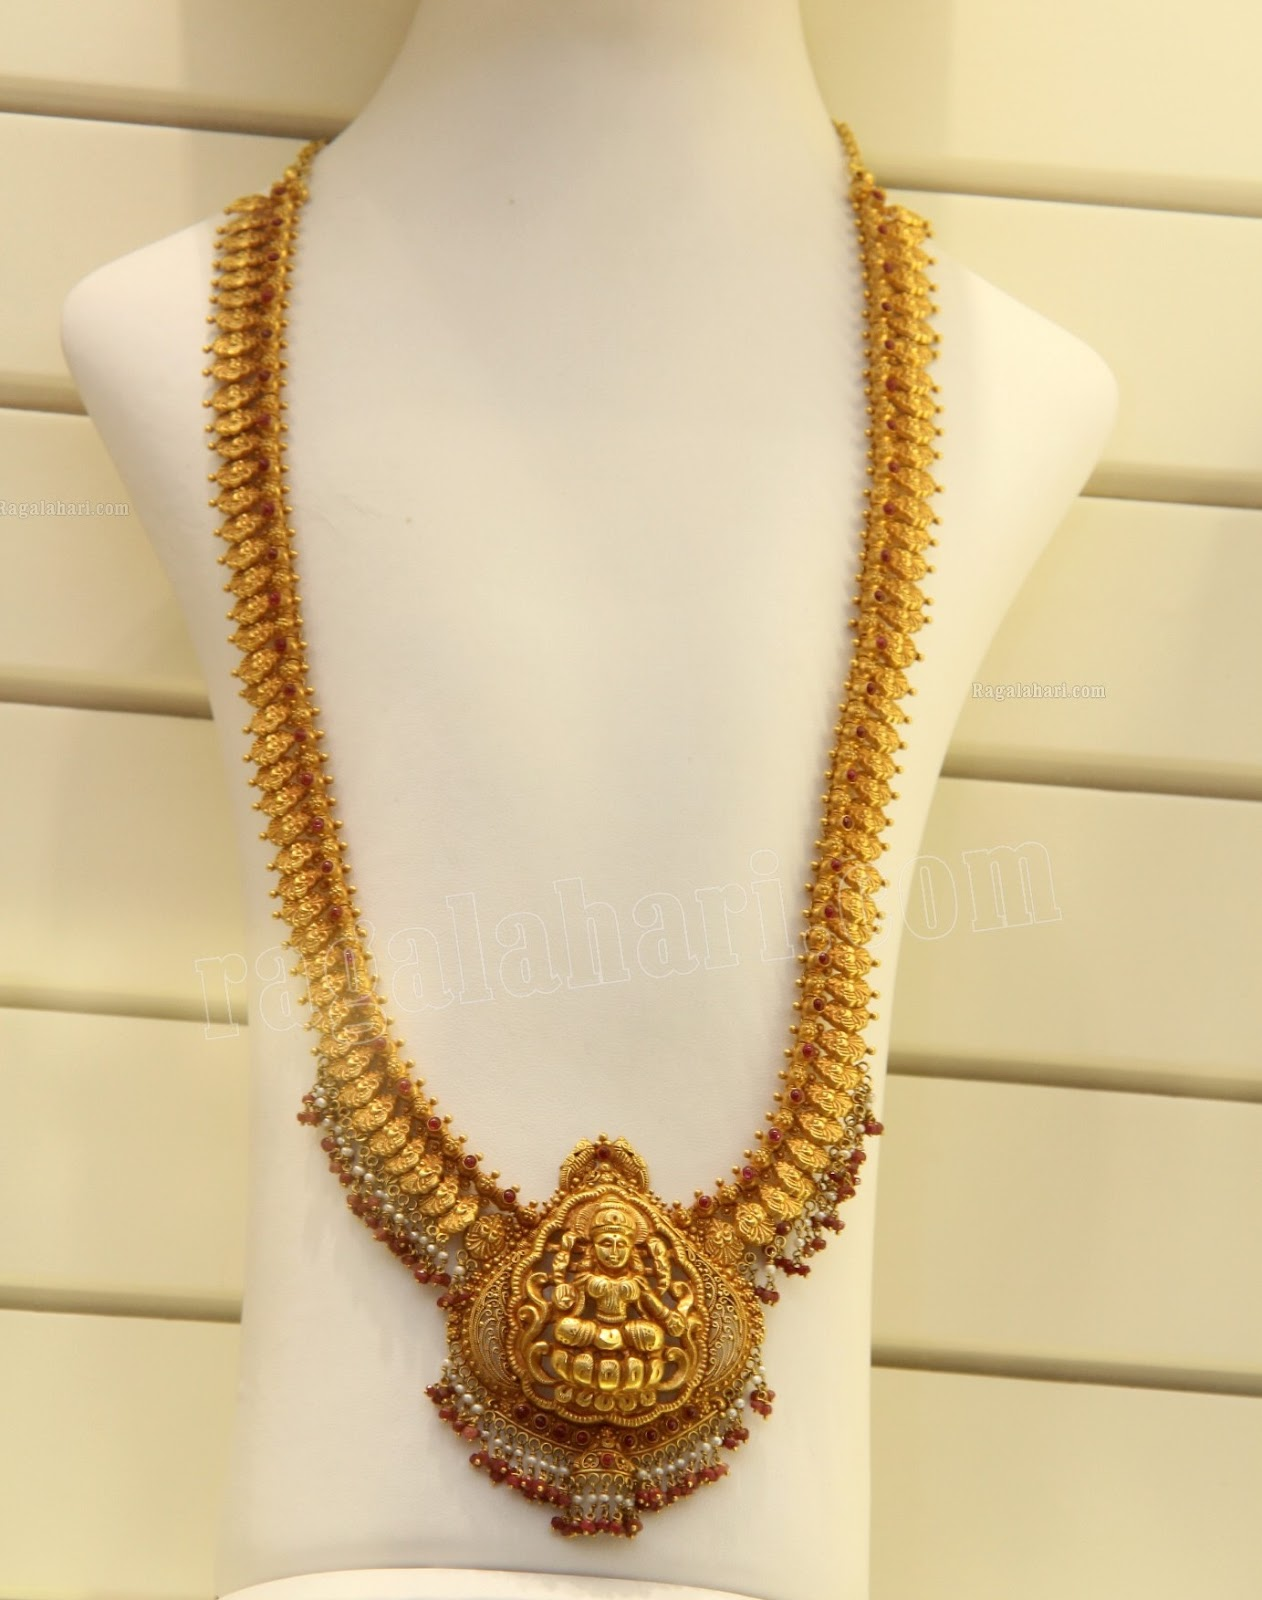 Suhasini in gundla haram jewellery designs - Antique Long Chain